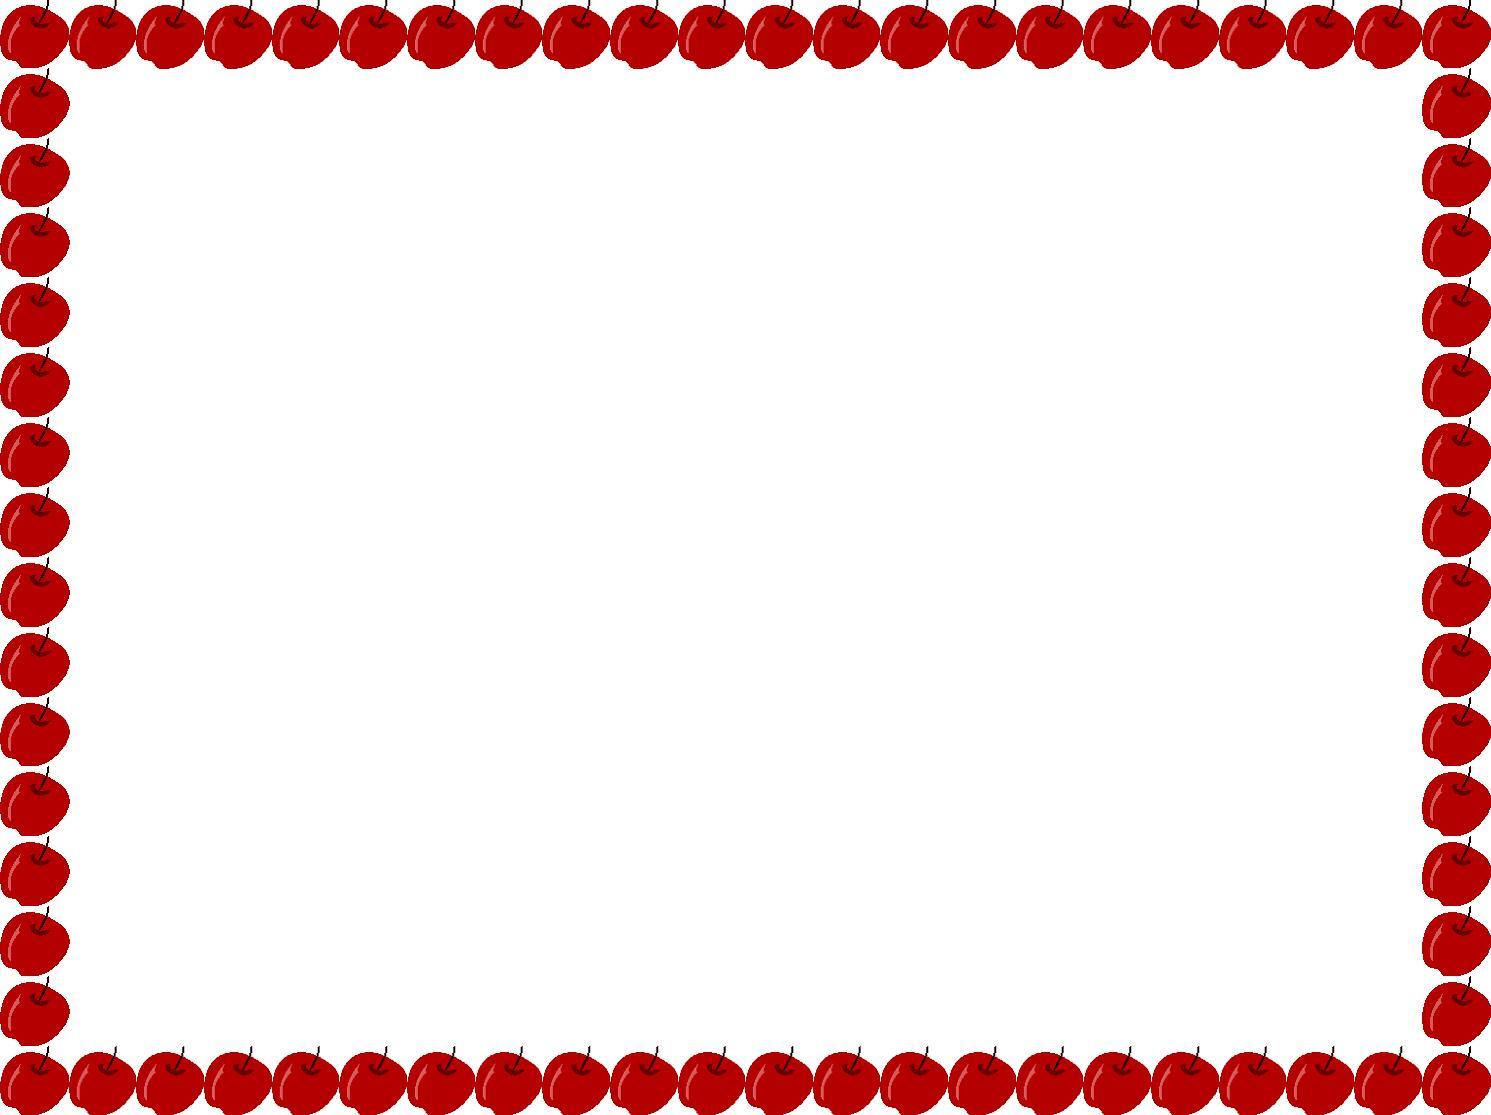 free clip art borders for mac - photo #13